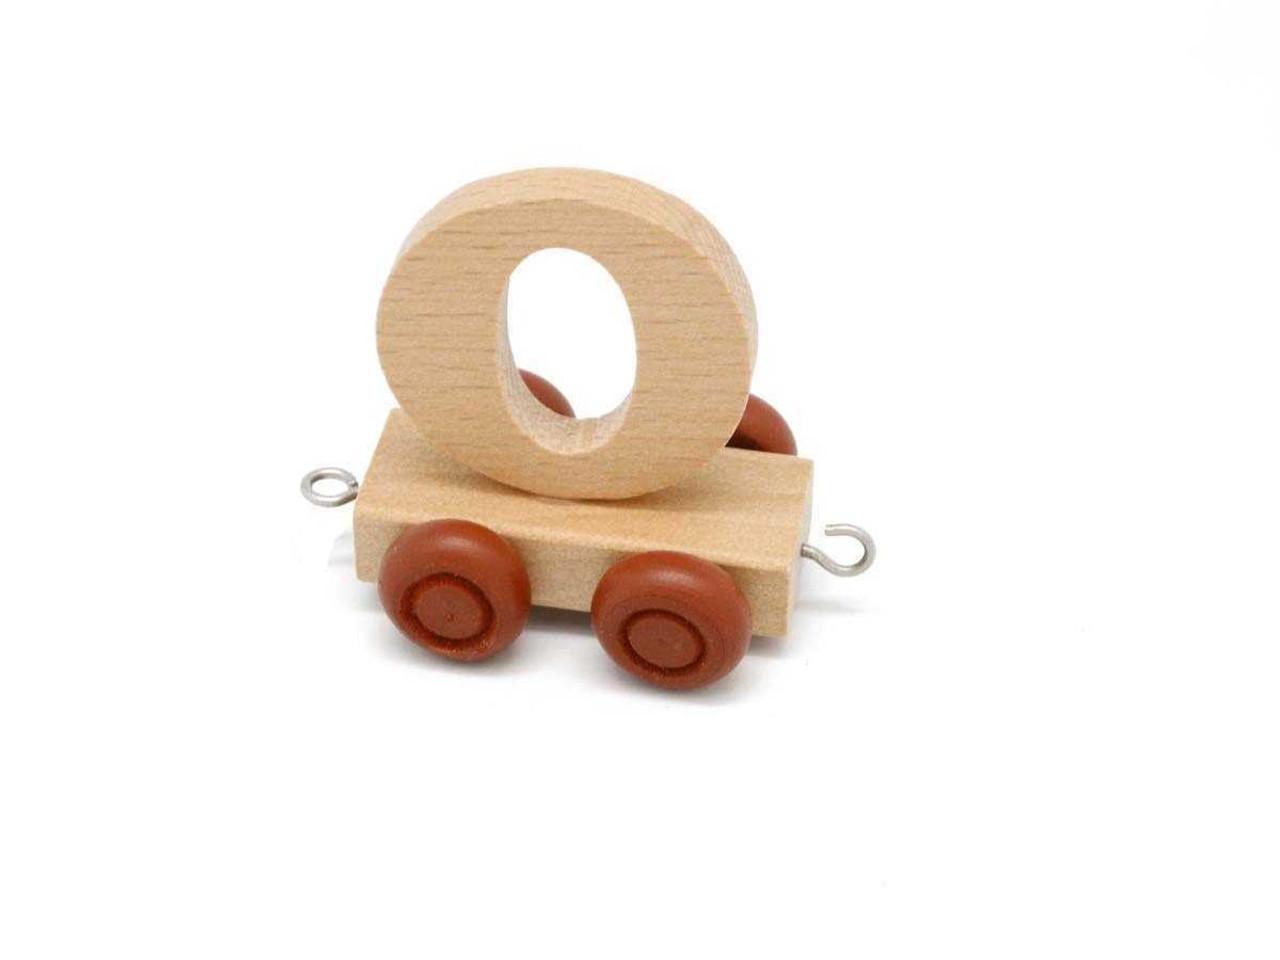 Kaper Kidz Wooden Carriage Letter O